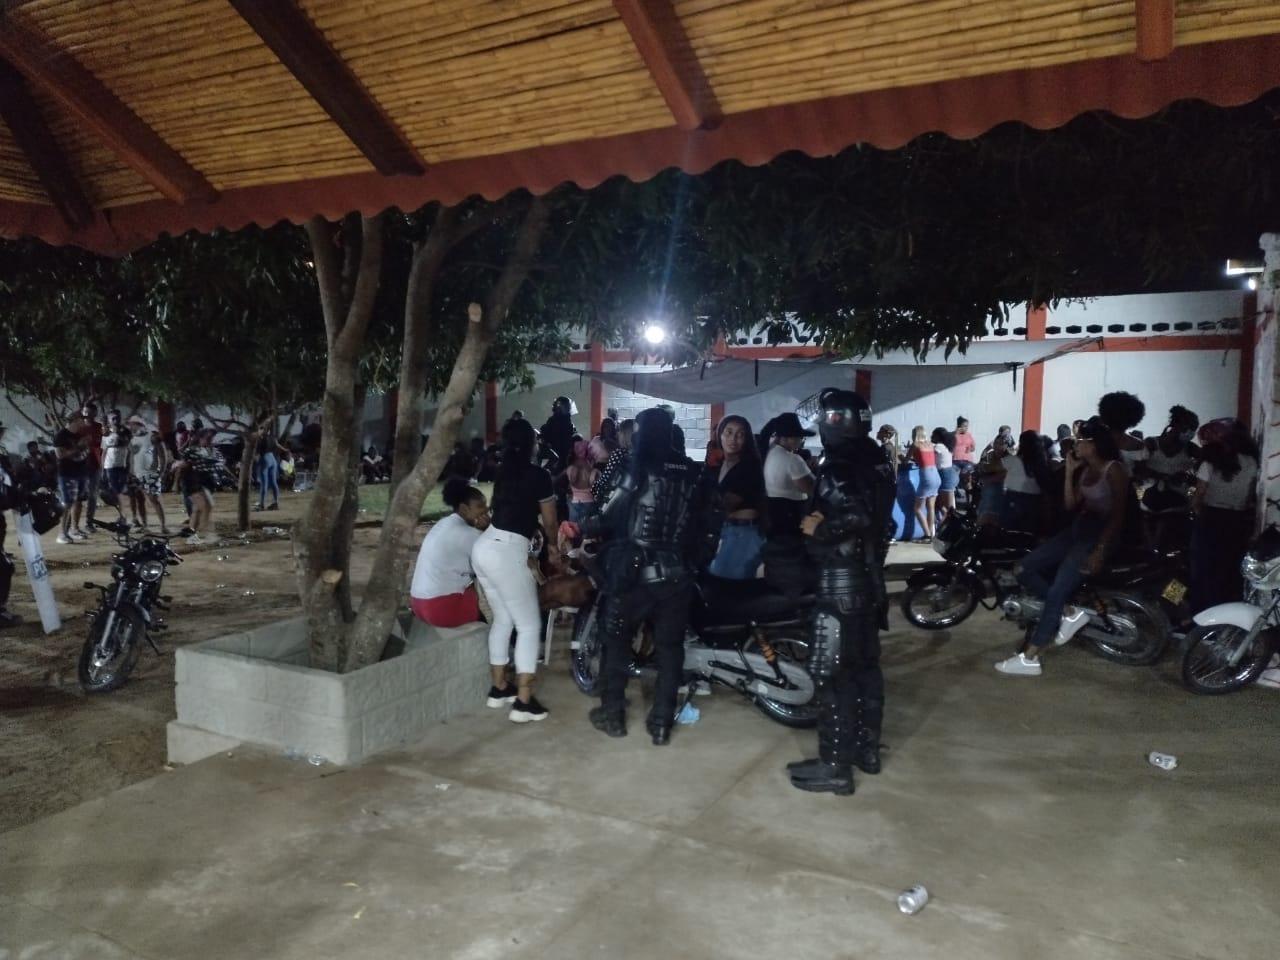 https://www.notasrosas.com/En Riohacha: Policía Guajira disolvió 'Fiesta Pro Covid-19', con de más 200 participantes